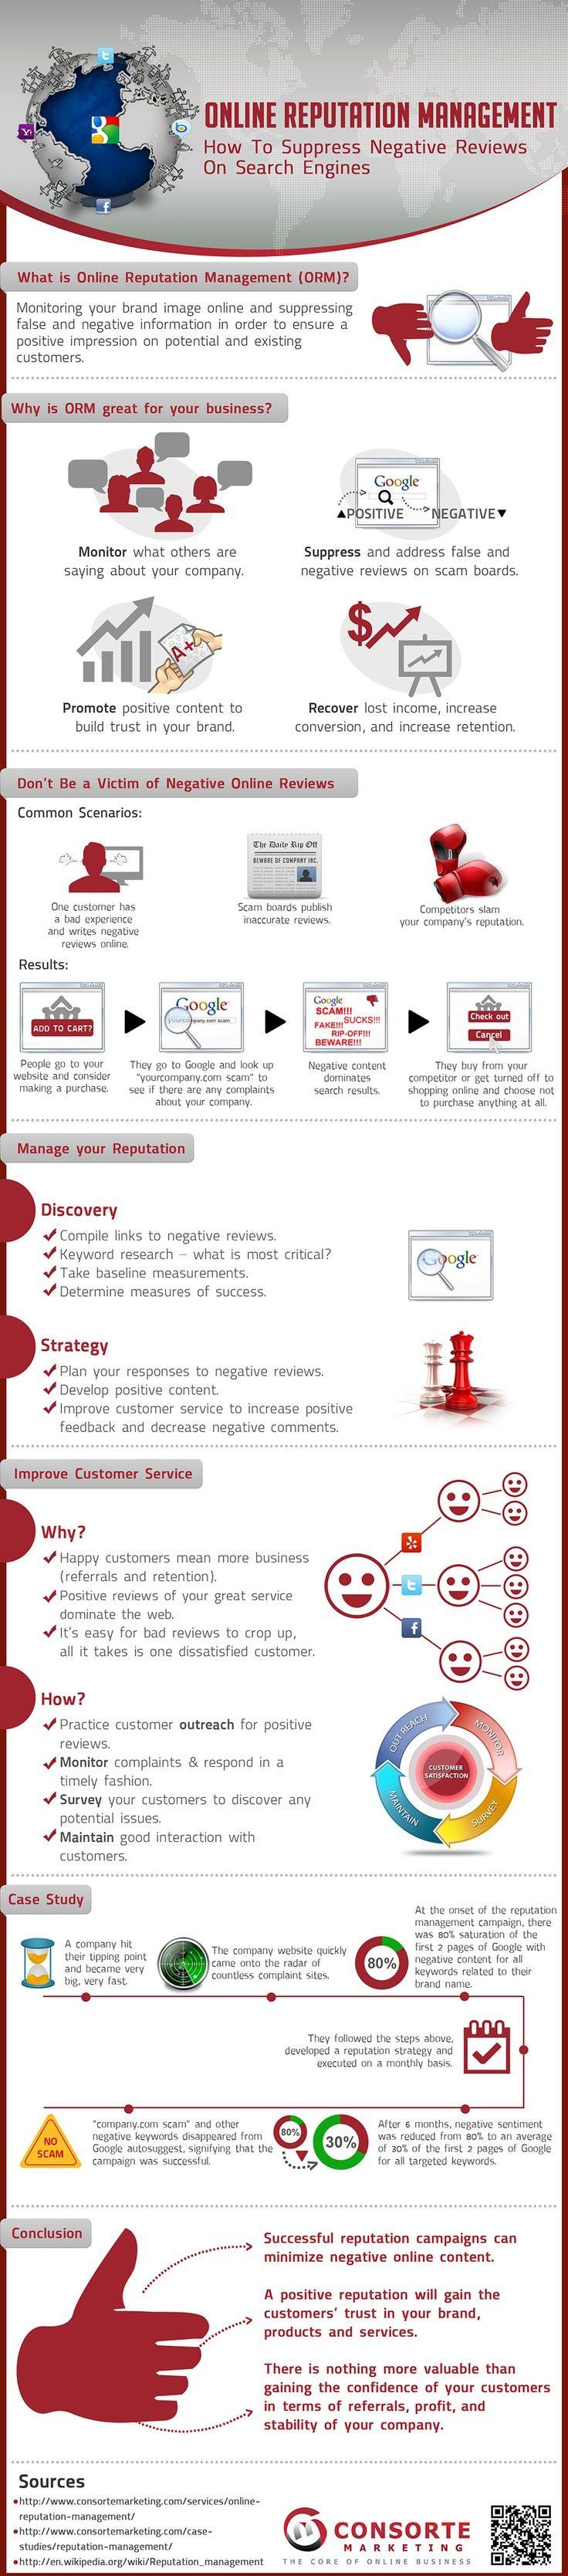 Online Reputation Management - ORM #SEO #SEM #OrganicSearch #PPC #PayPerClick